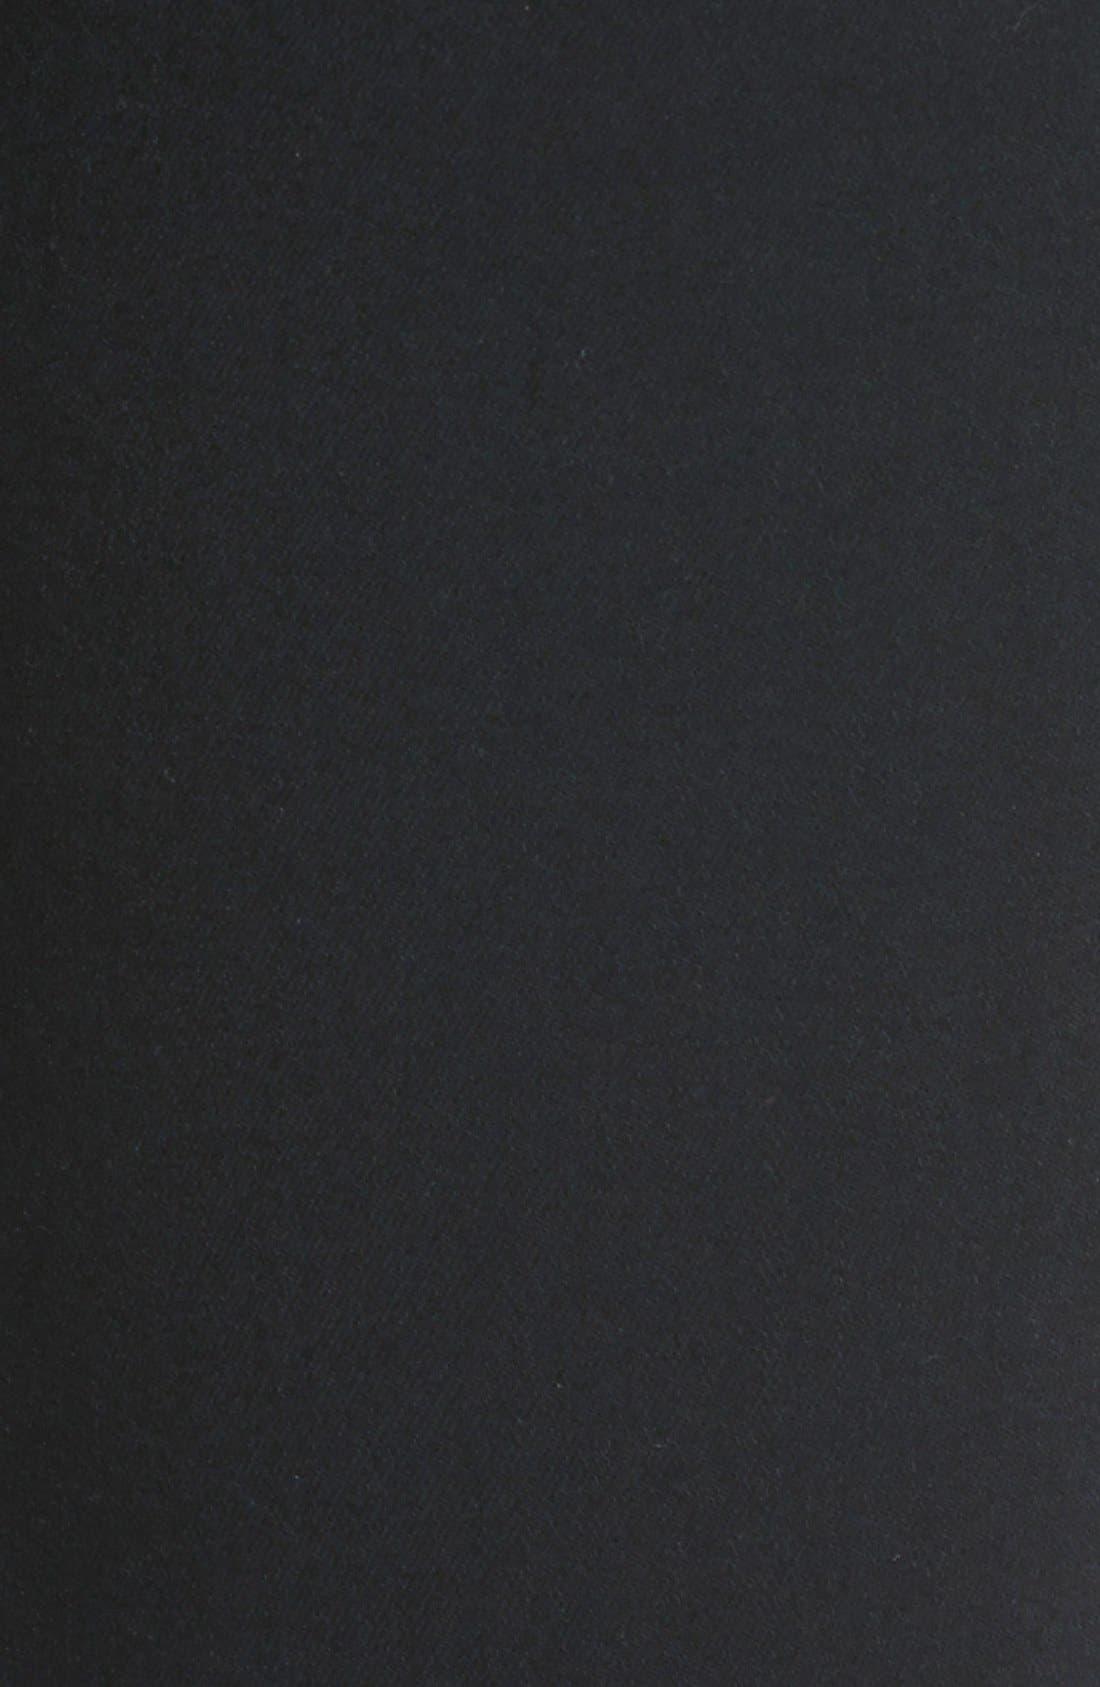 Transcend - Verdugo Ankle Ultra Skinny Jeans,                             Alternate thumbnail 12, color,                             BLACK SHADOW